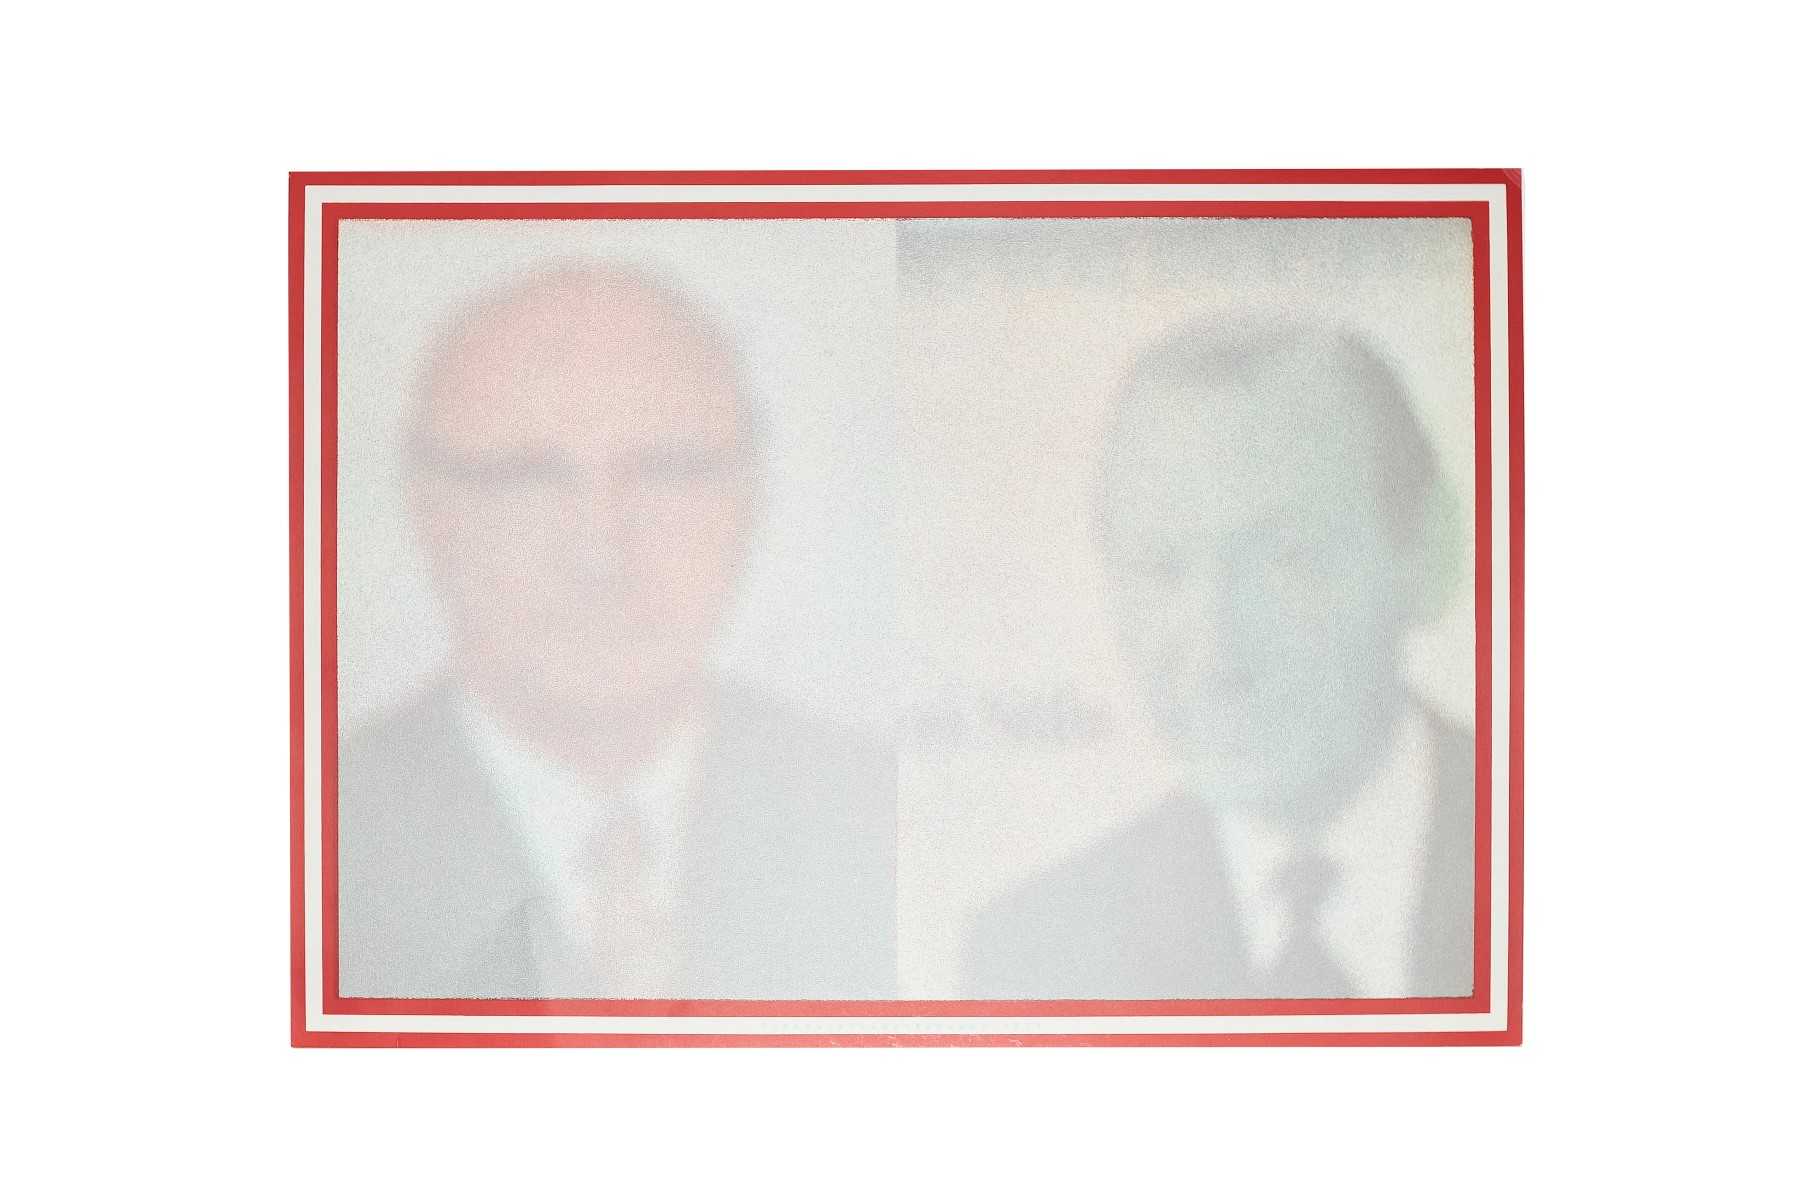 #18 Erich Thorn* (1930-2012), Federal President